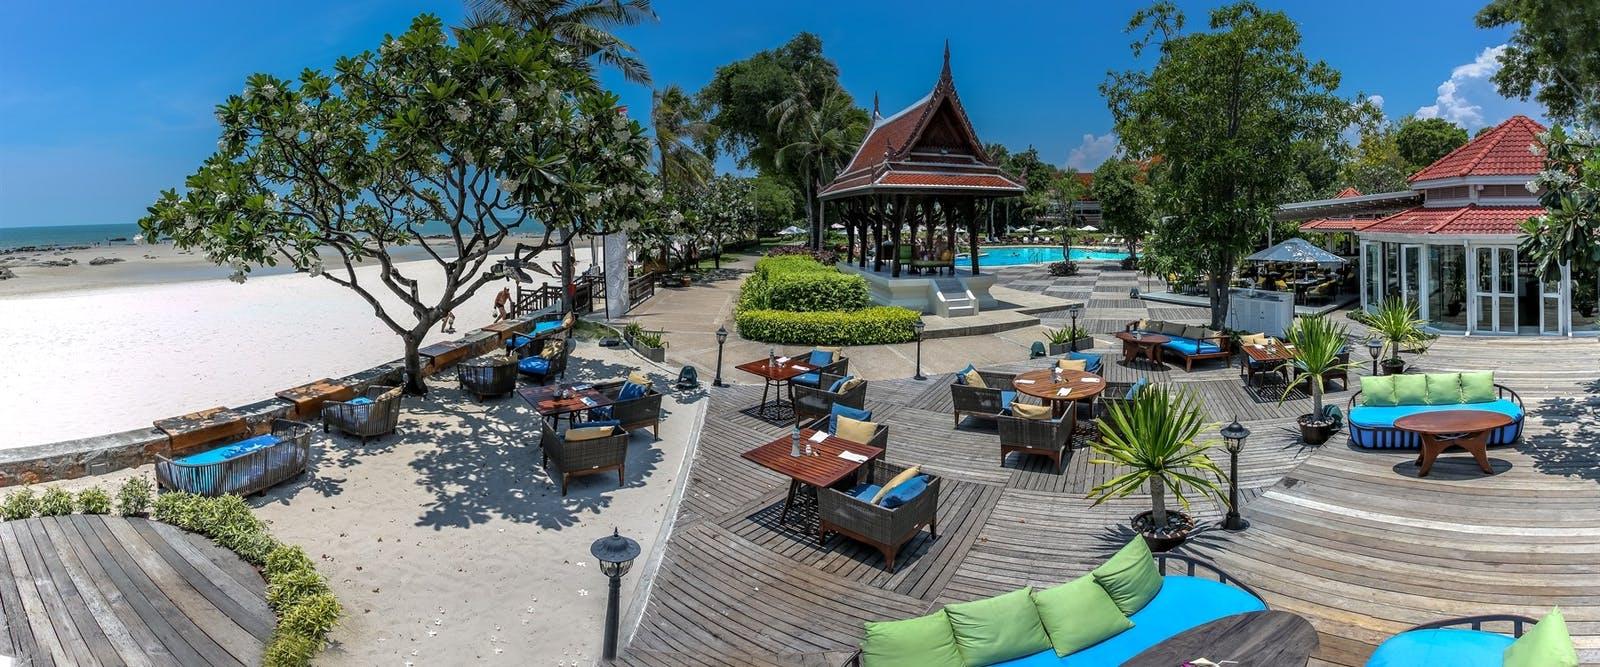 Centara Grand Beach Resort & Villas | Hua Hin | Thailand